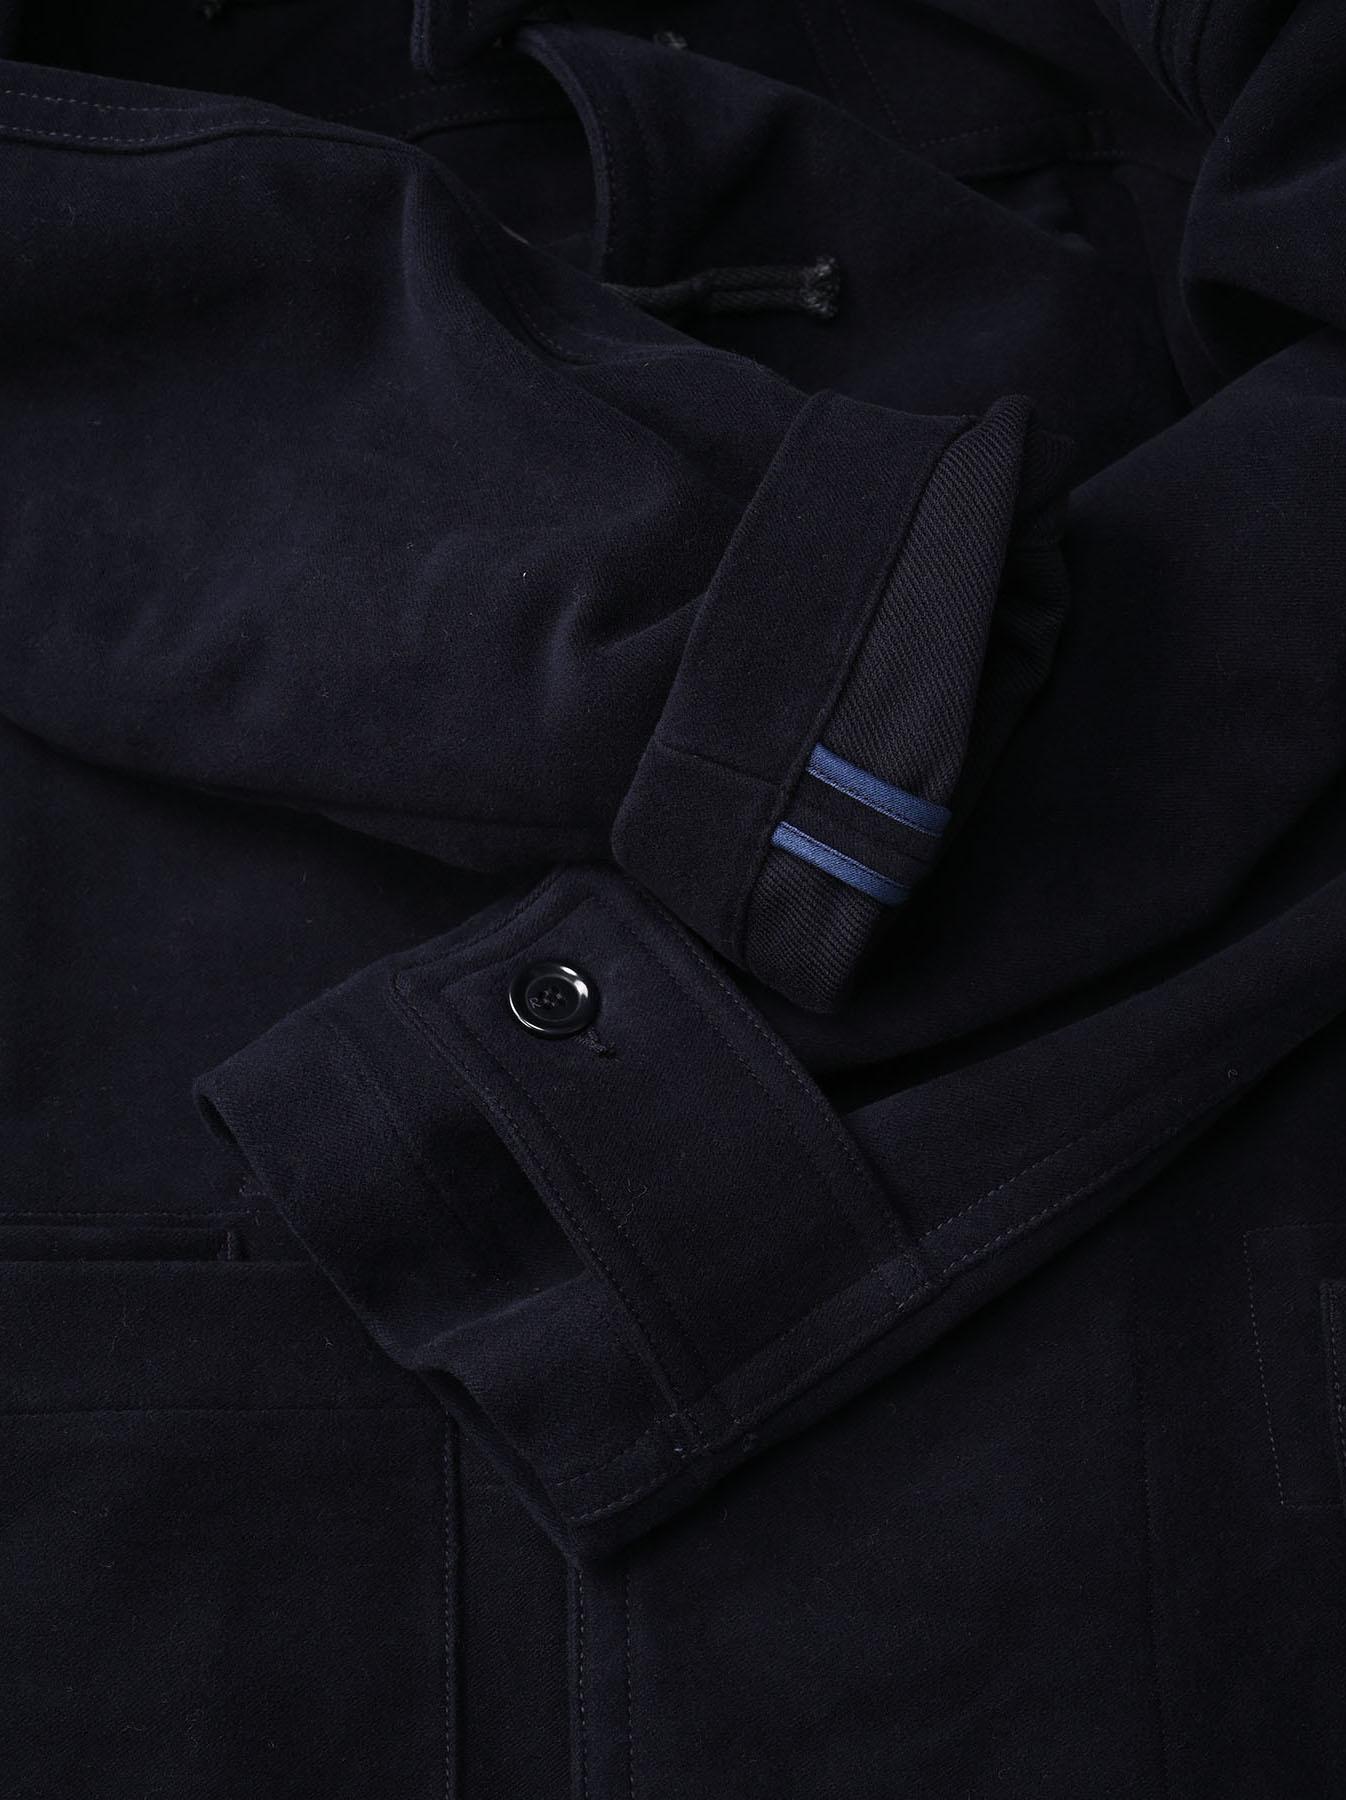 Thick Cotton Flannel Hayama Duffle Coat-9